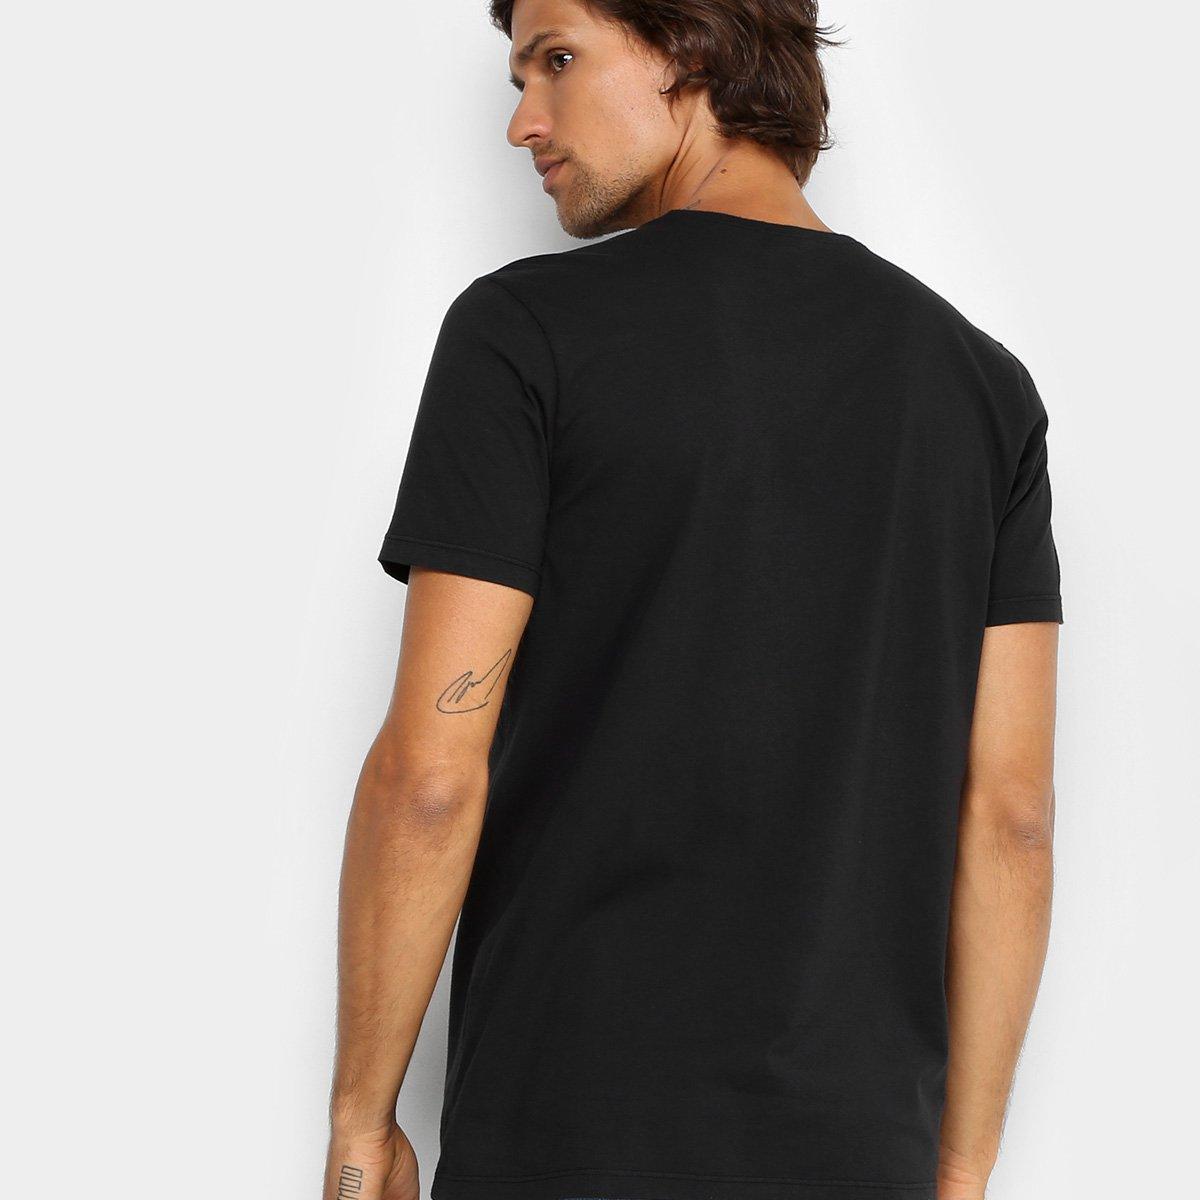 49536c165 Camiseta Forum LXX Masculina  Camiseta Forum LXX Masculina ...